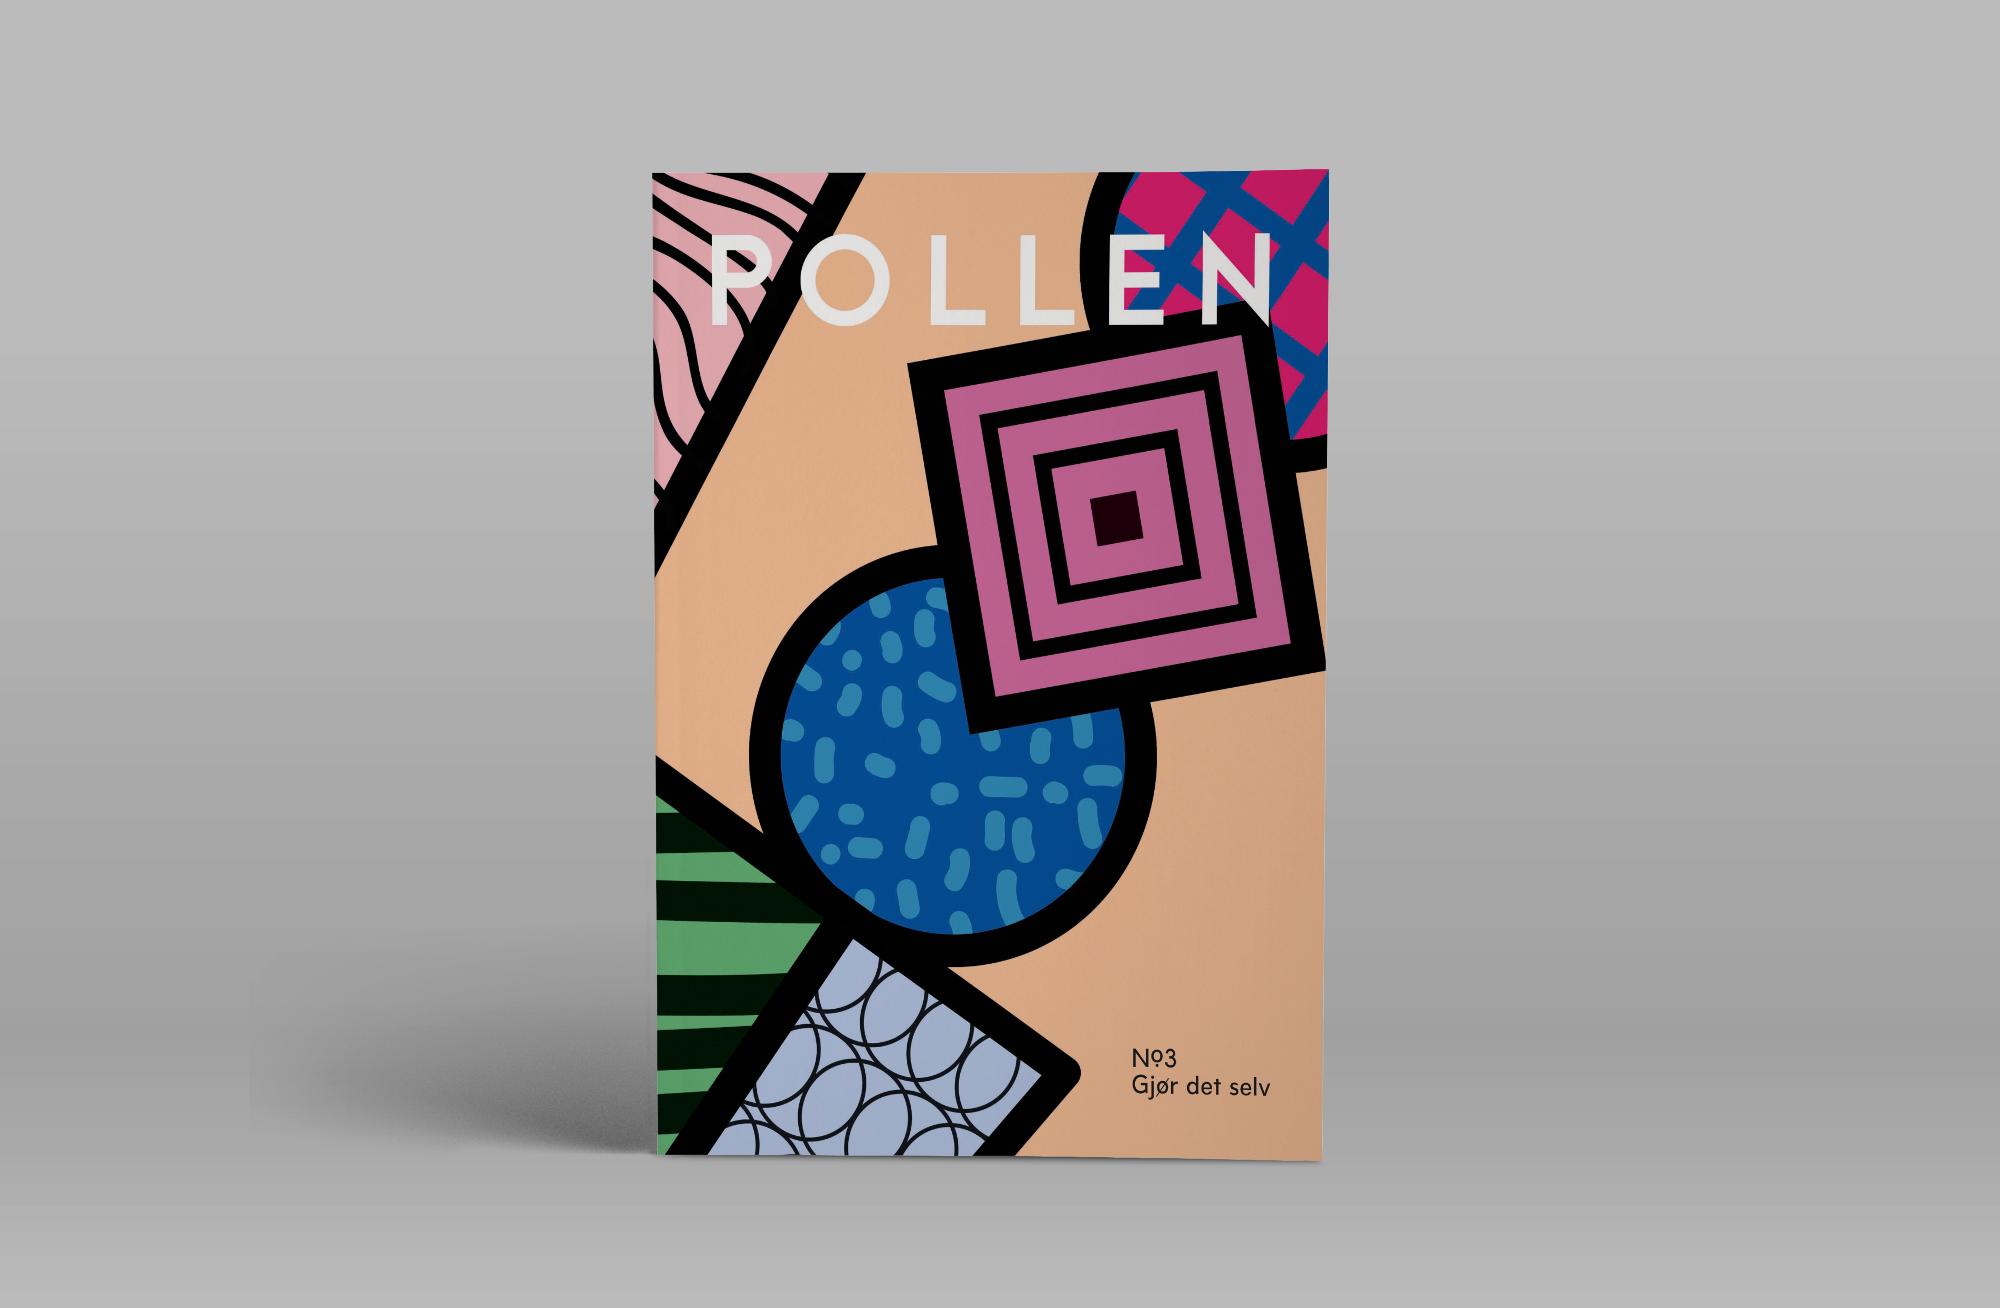 pollen_01